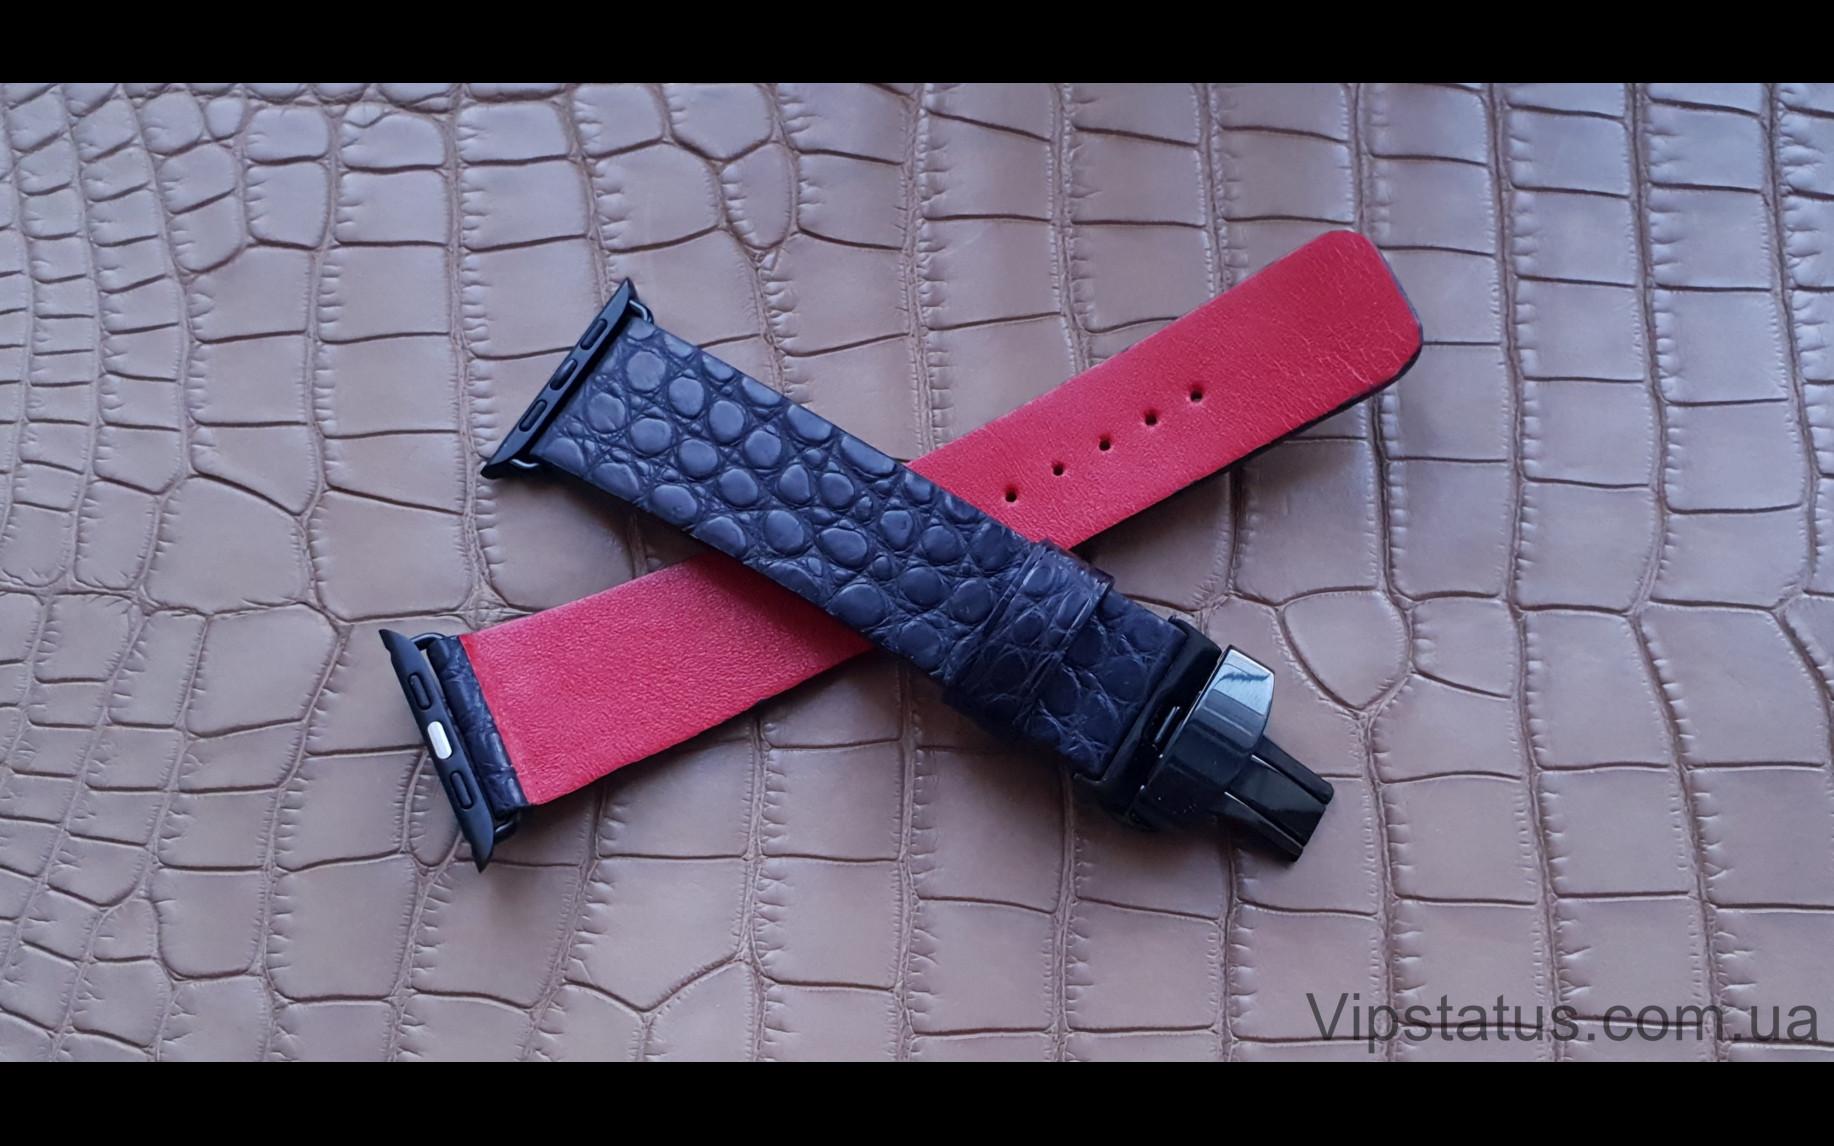 Elite Экзотический ремешок для часов Apple кожа крокодила Exotic Crocodile Strap for Apple watches image 3